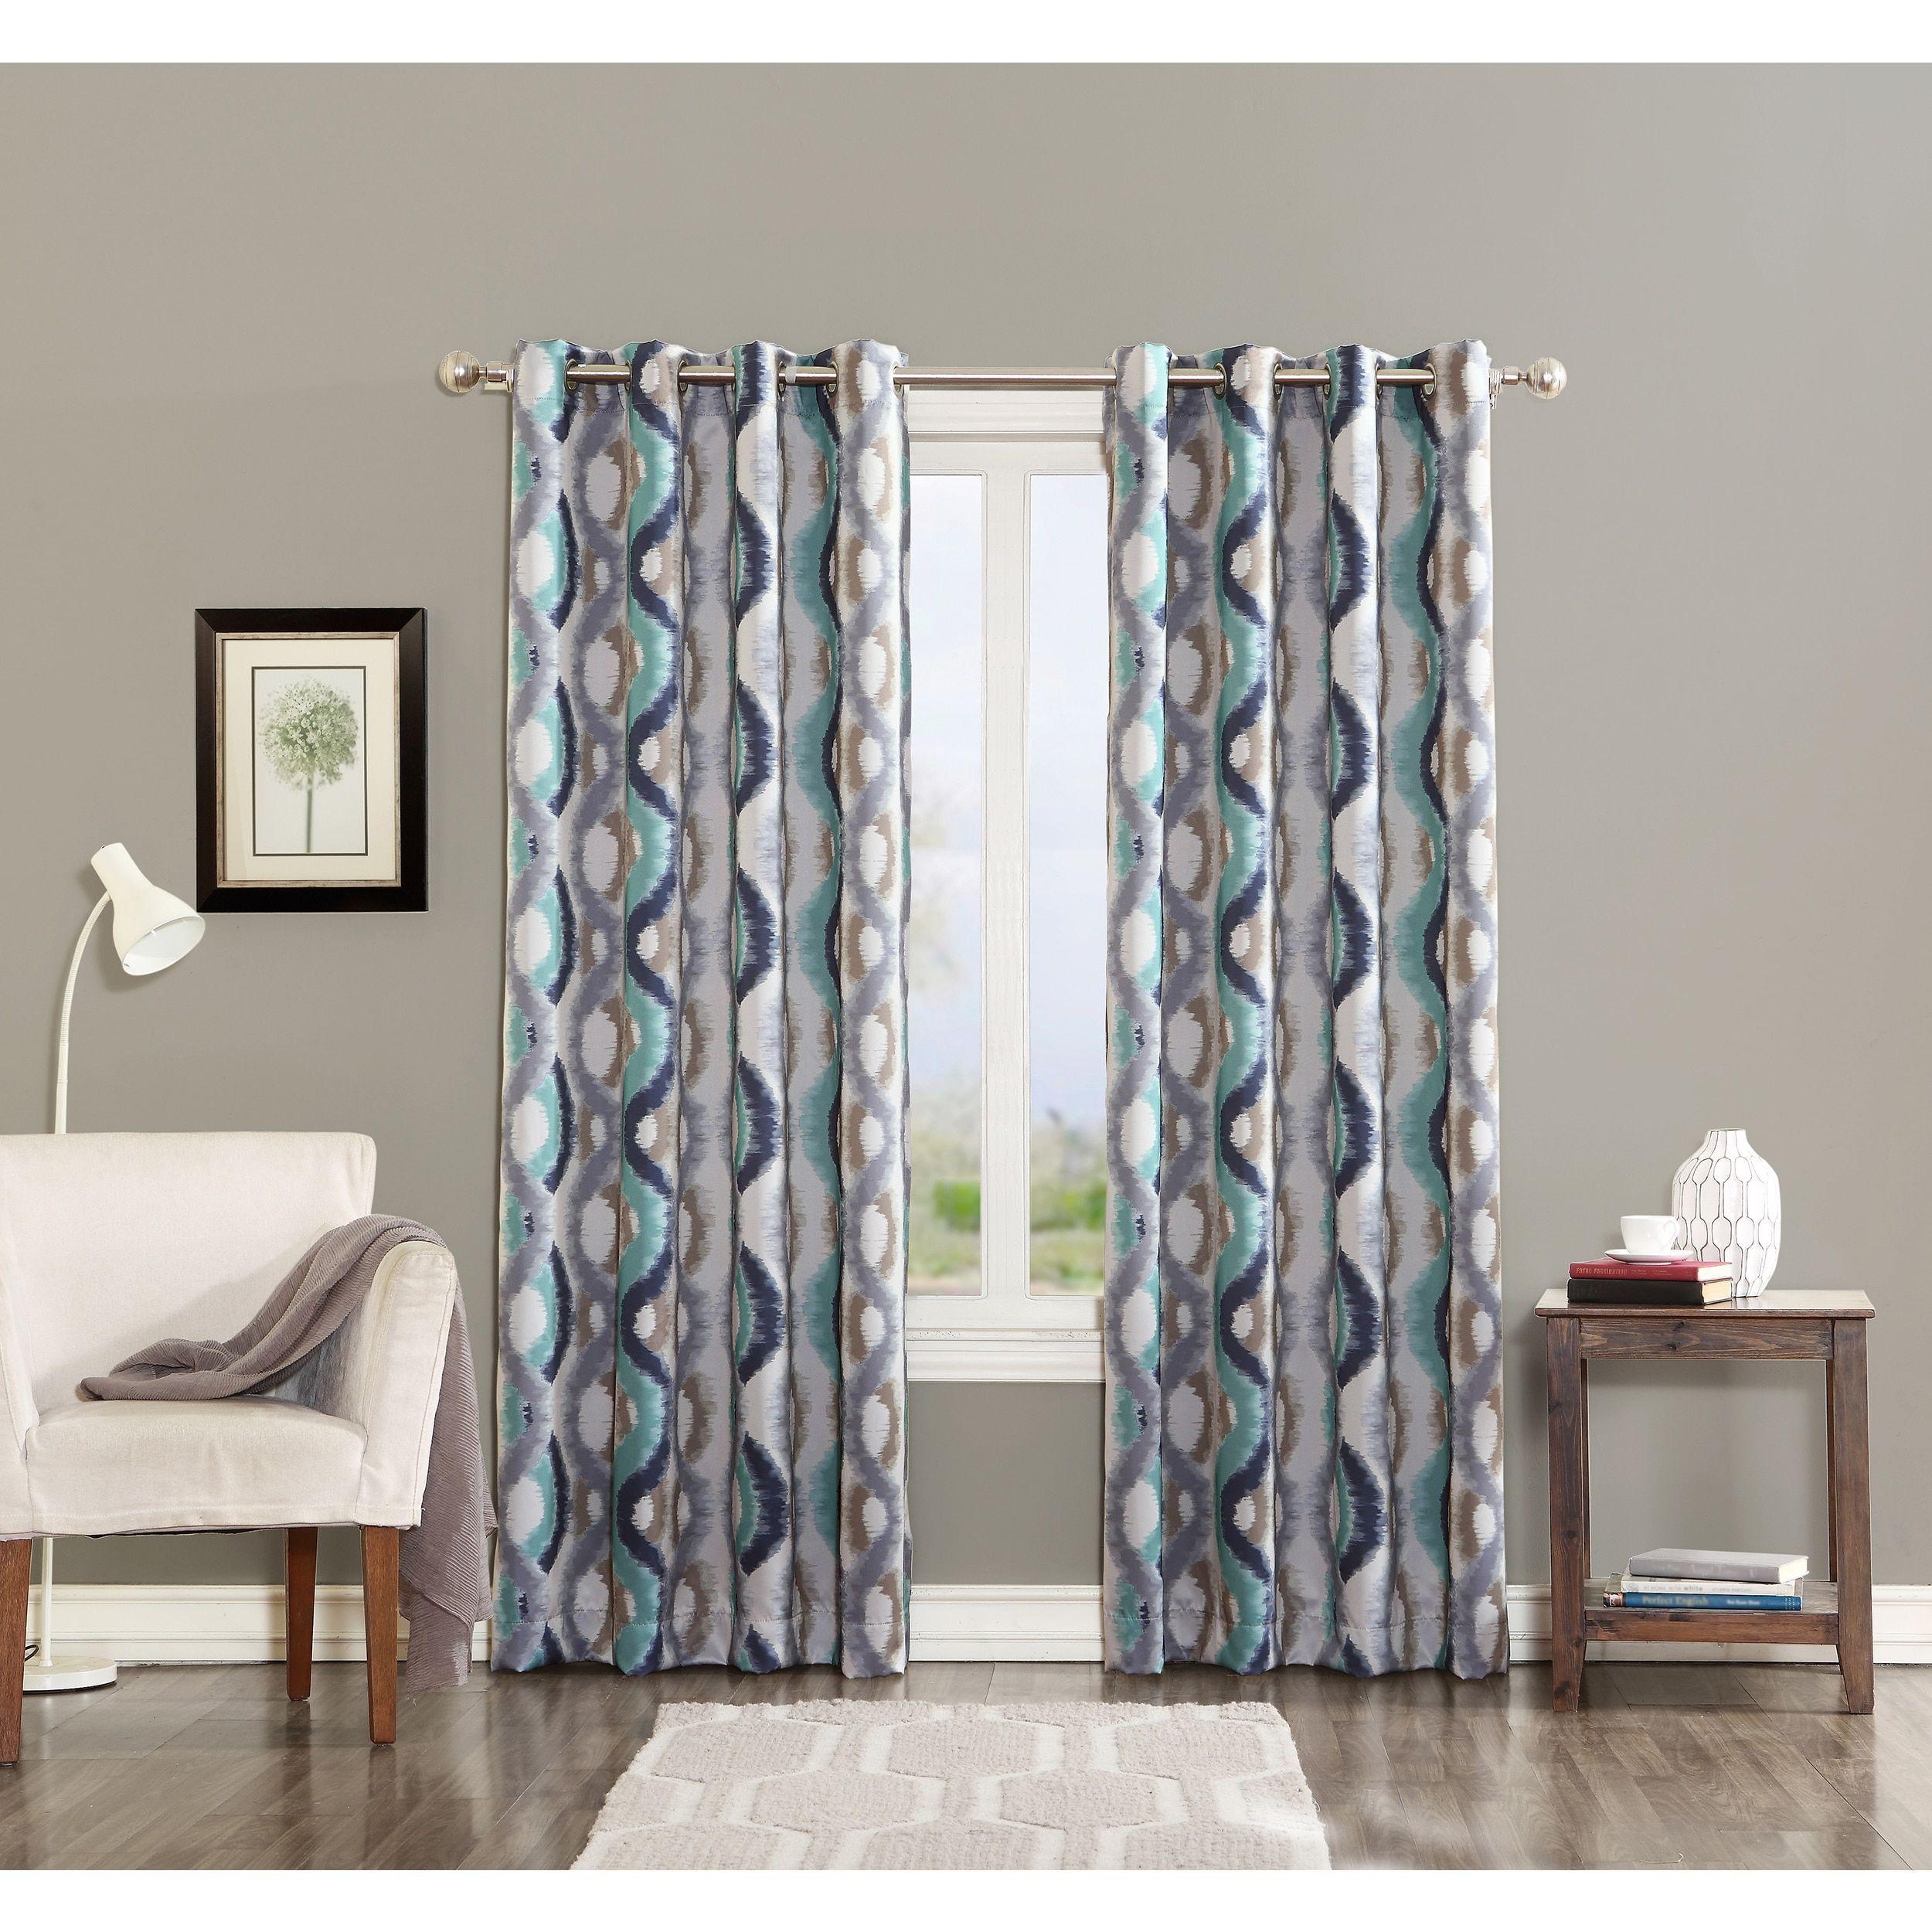 Sun Zero Watercolor Print Room Darkening Grommet Curtain Panel 95 Inches Linen Natural Polyester Geometric Panel Curtains Drapes Curtains Grommet Curtains